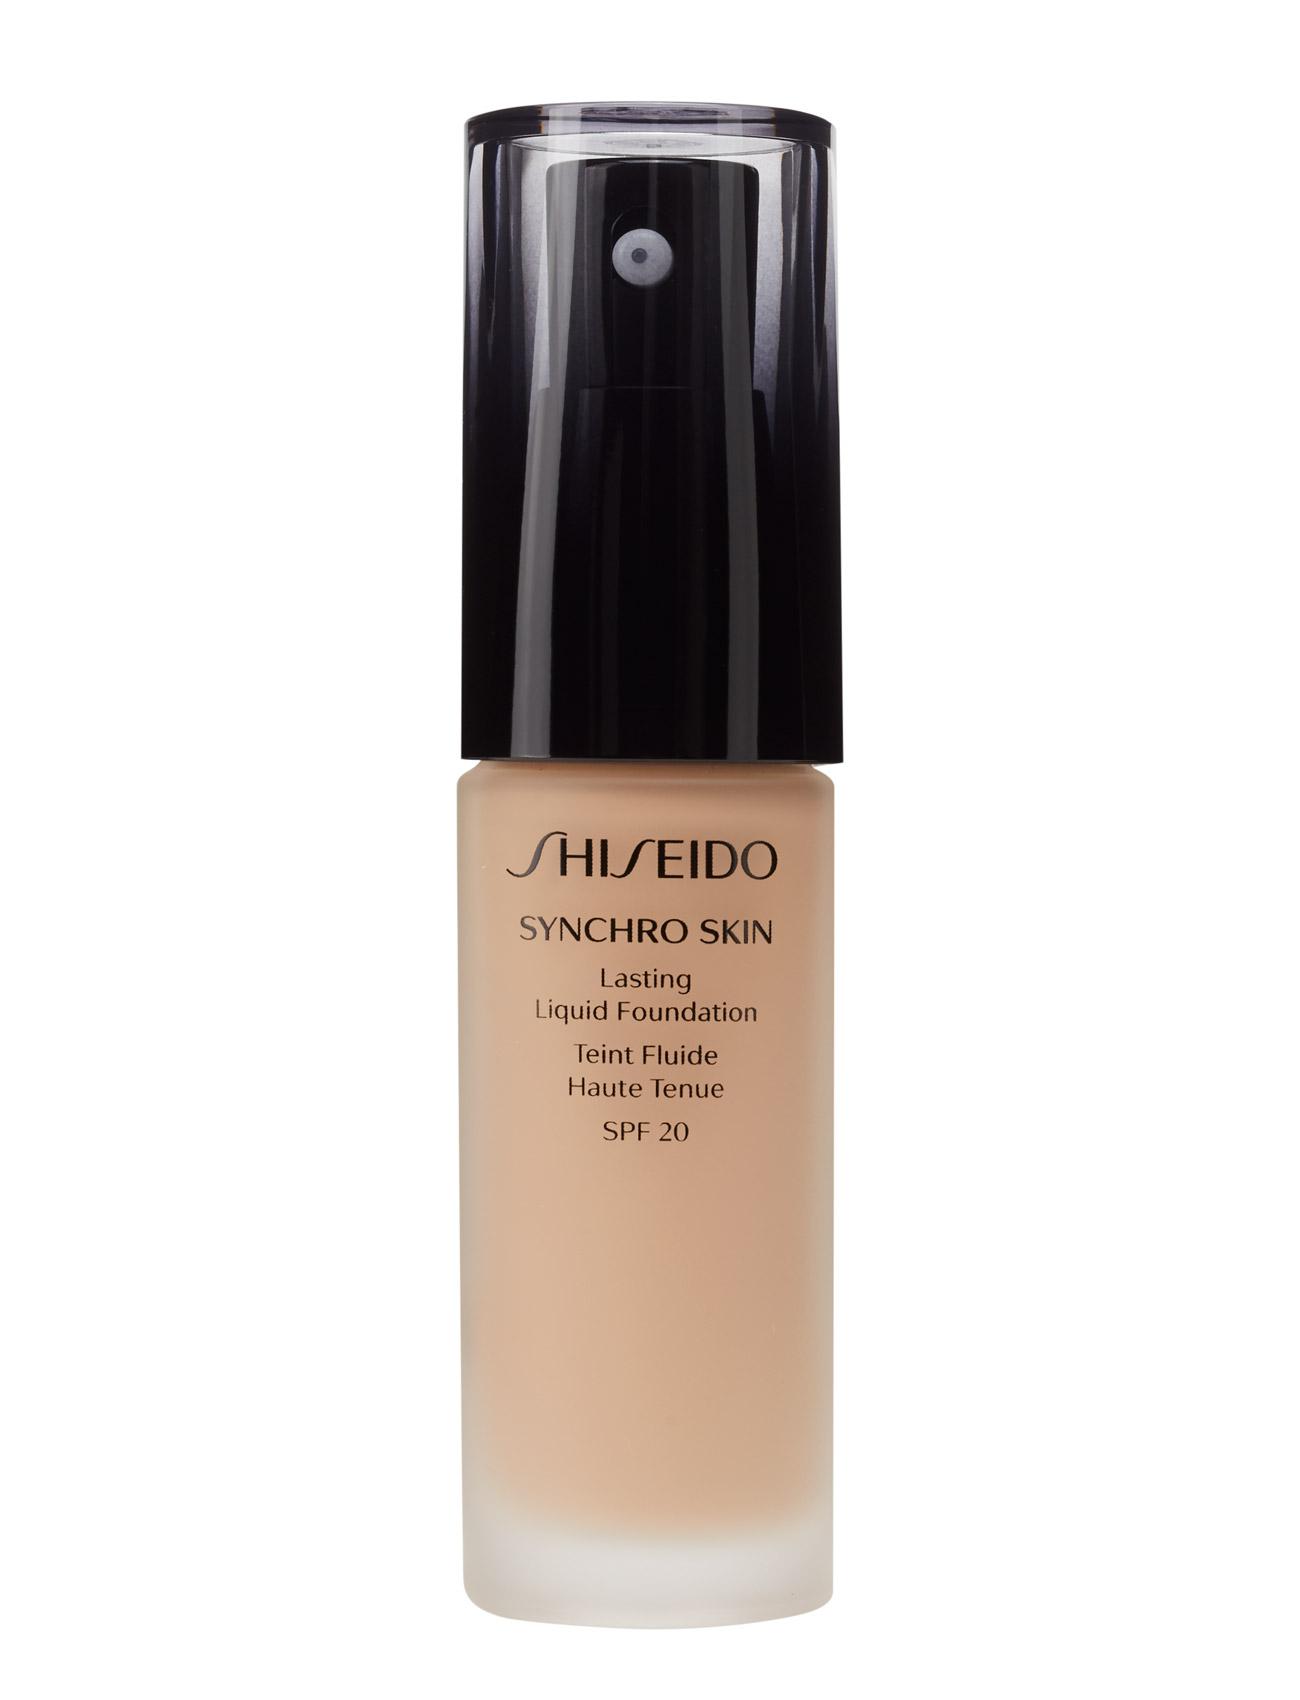 shiseido – Shiseido synchro skin foundation 3 fra boozt.com dk